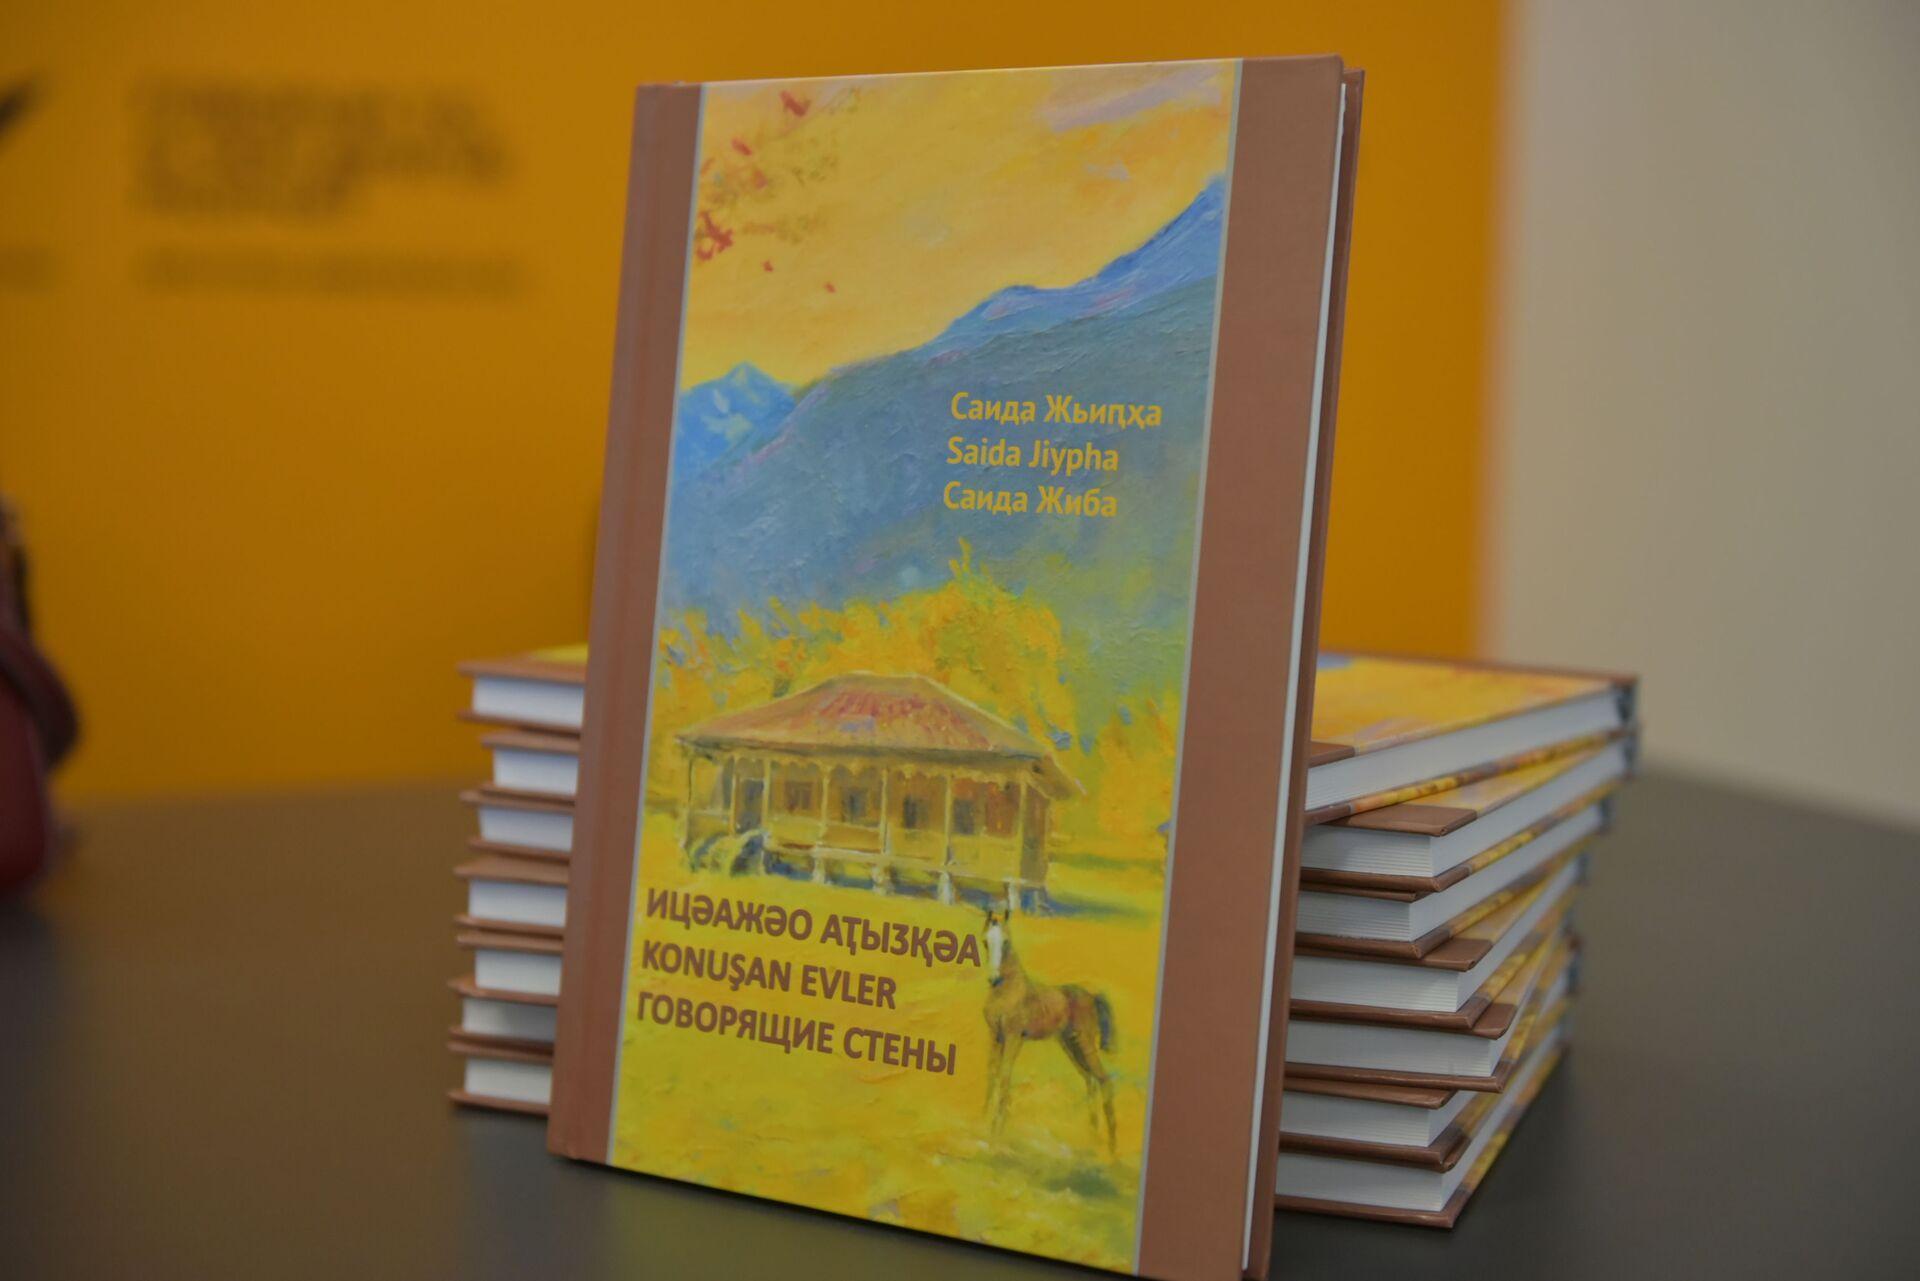 Дома с историей: журналист Саида Жиба представила в Sputnik свою новую книгу - Sputnik Абхазия, 1920, 15.07.2021